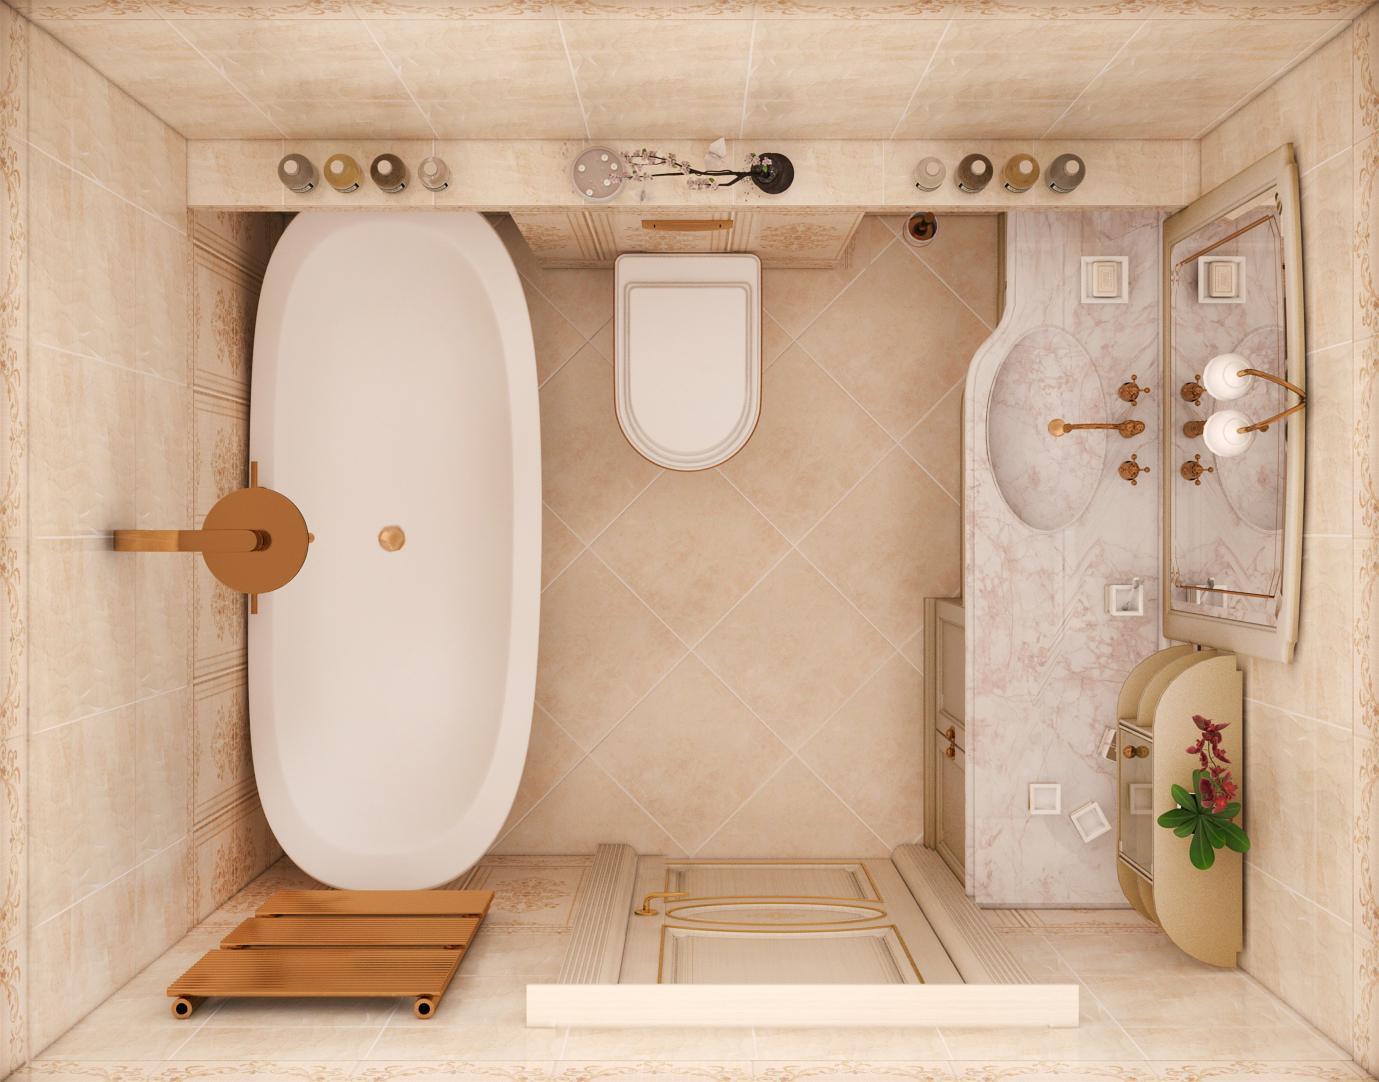 Виды дизайна интерьера санузла